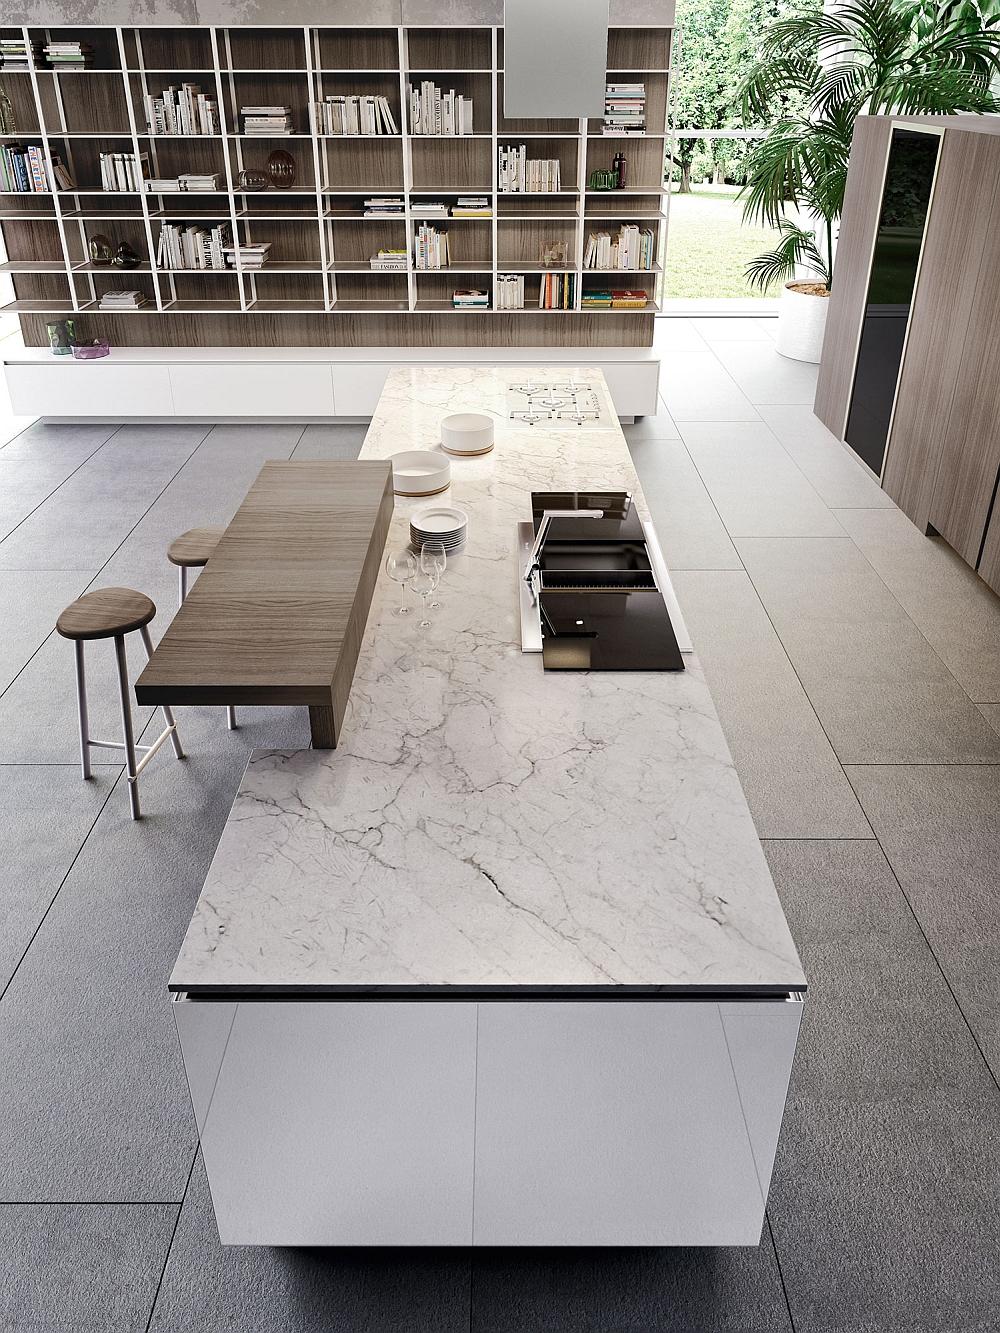 Потрясающий дизайн модульной кухни от Snaidero в стиле минимализма